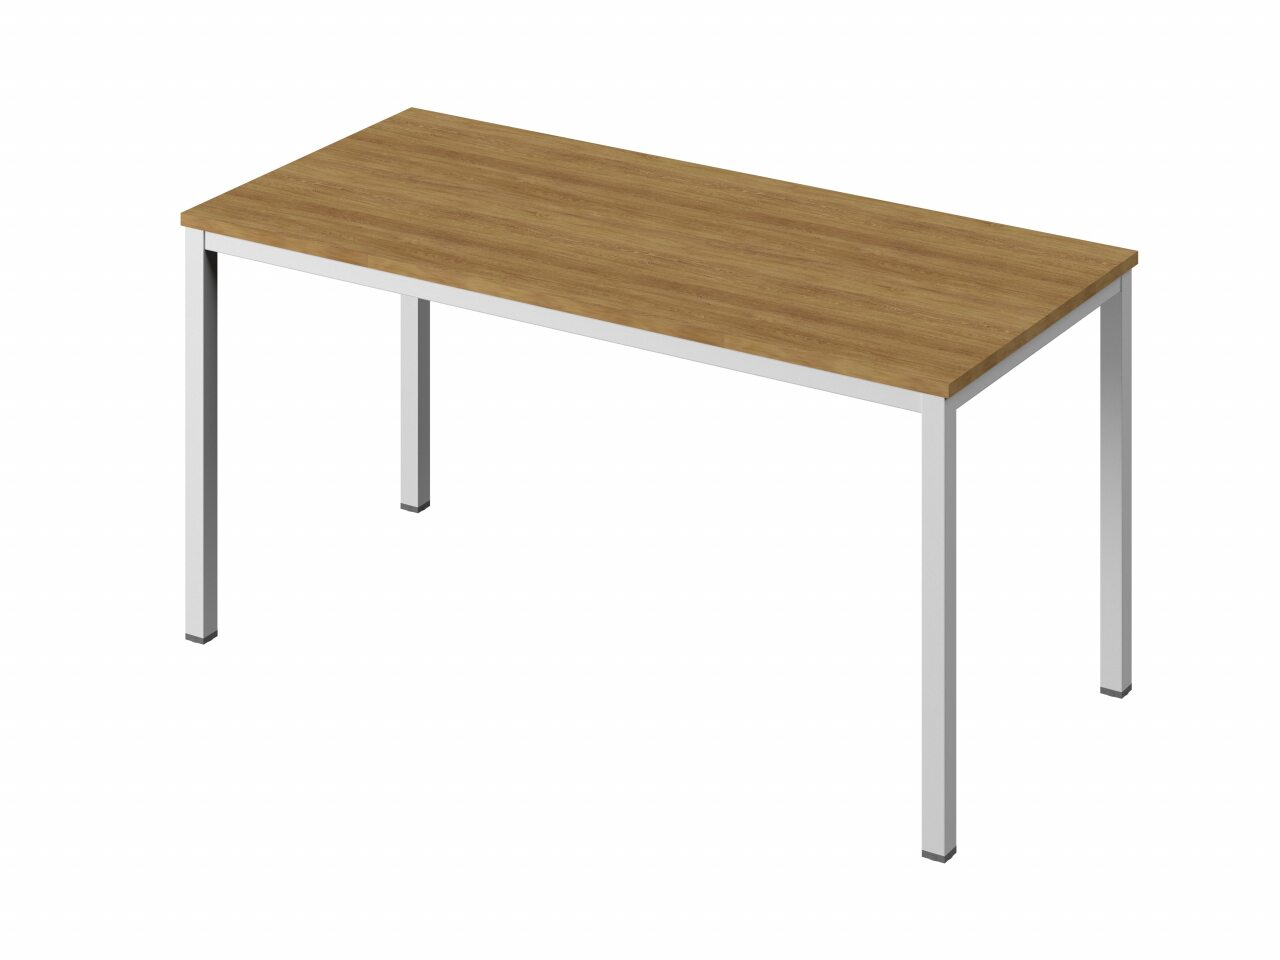 Стол на металлокаркасе без заглушек кабель-канала - фото 4